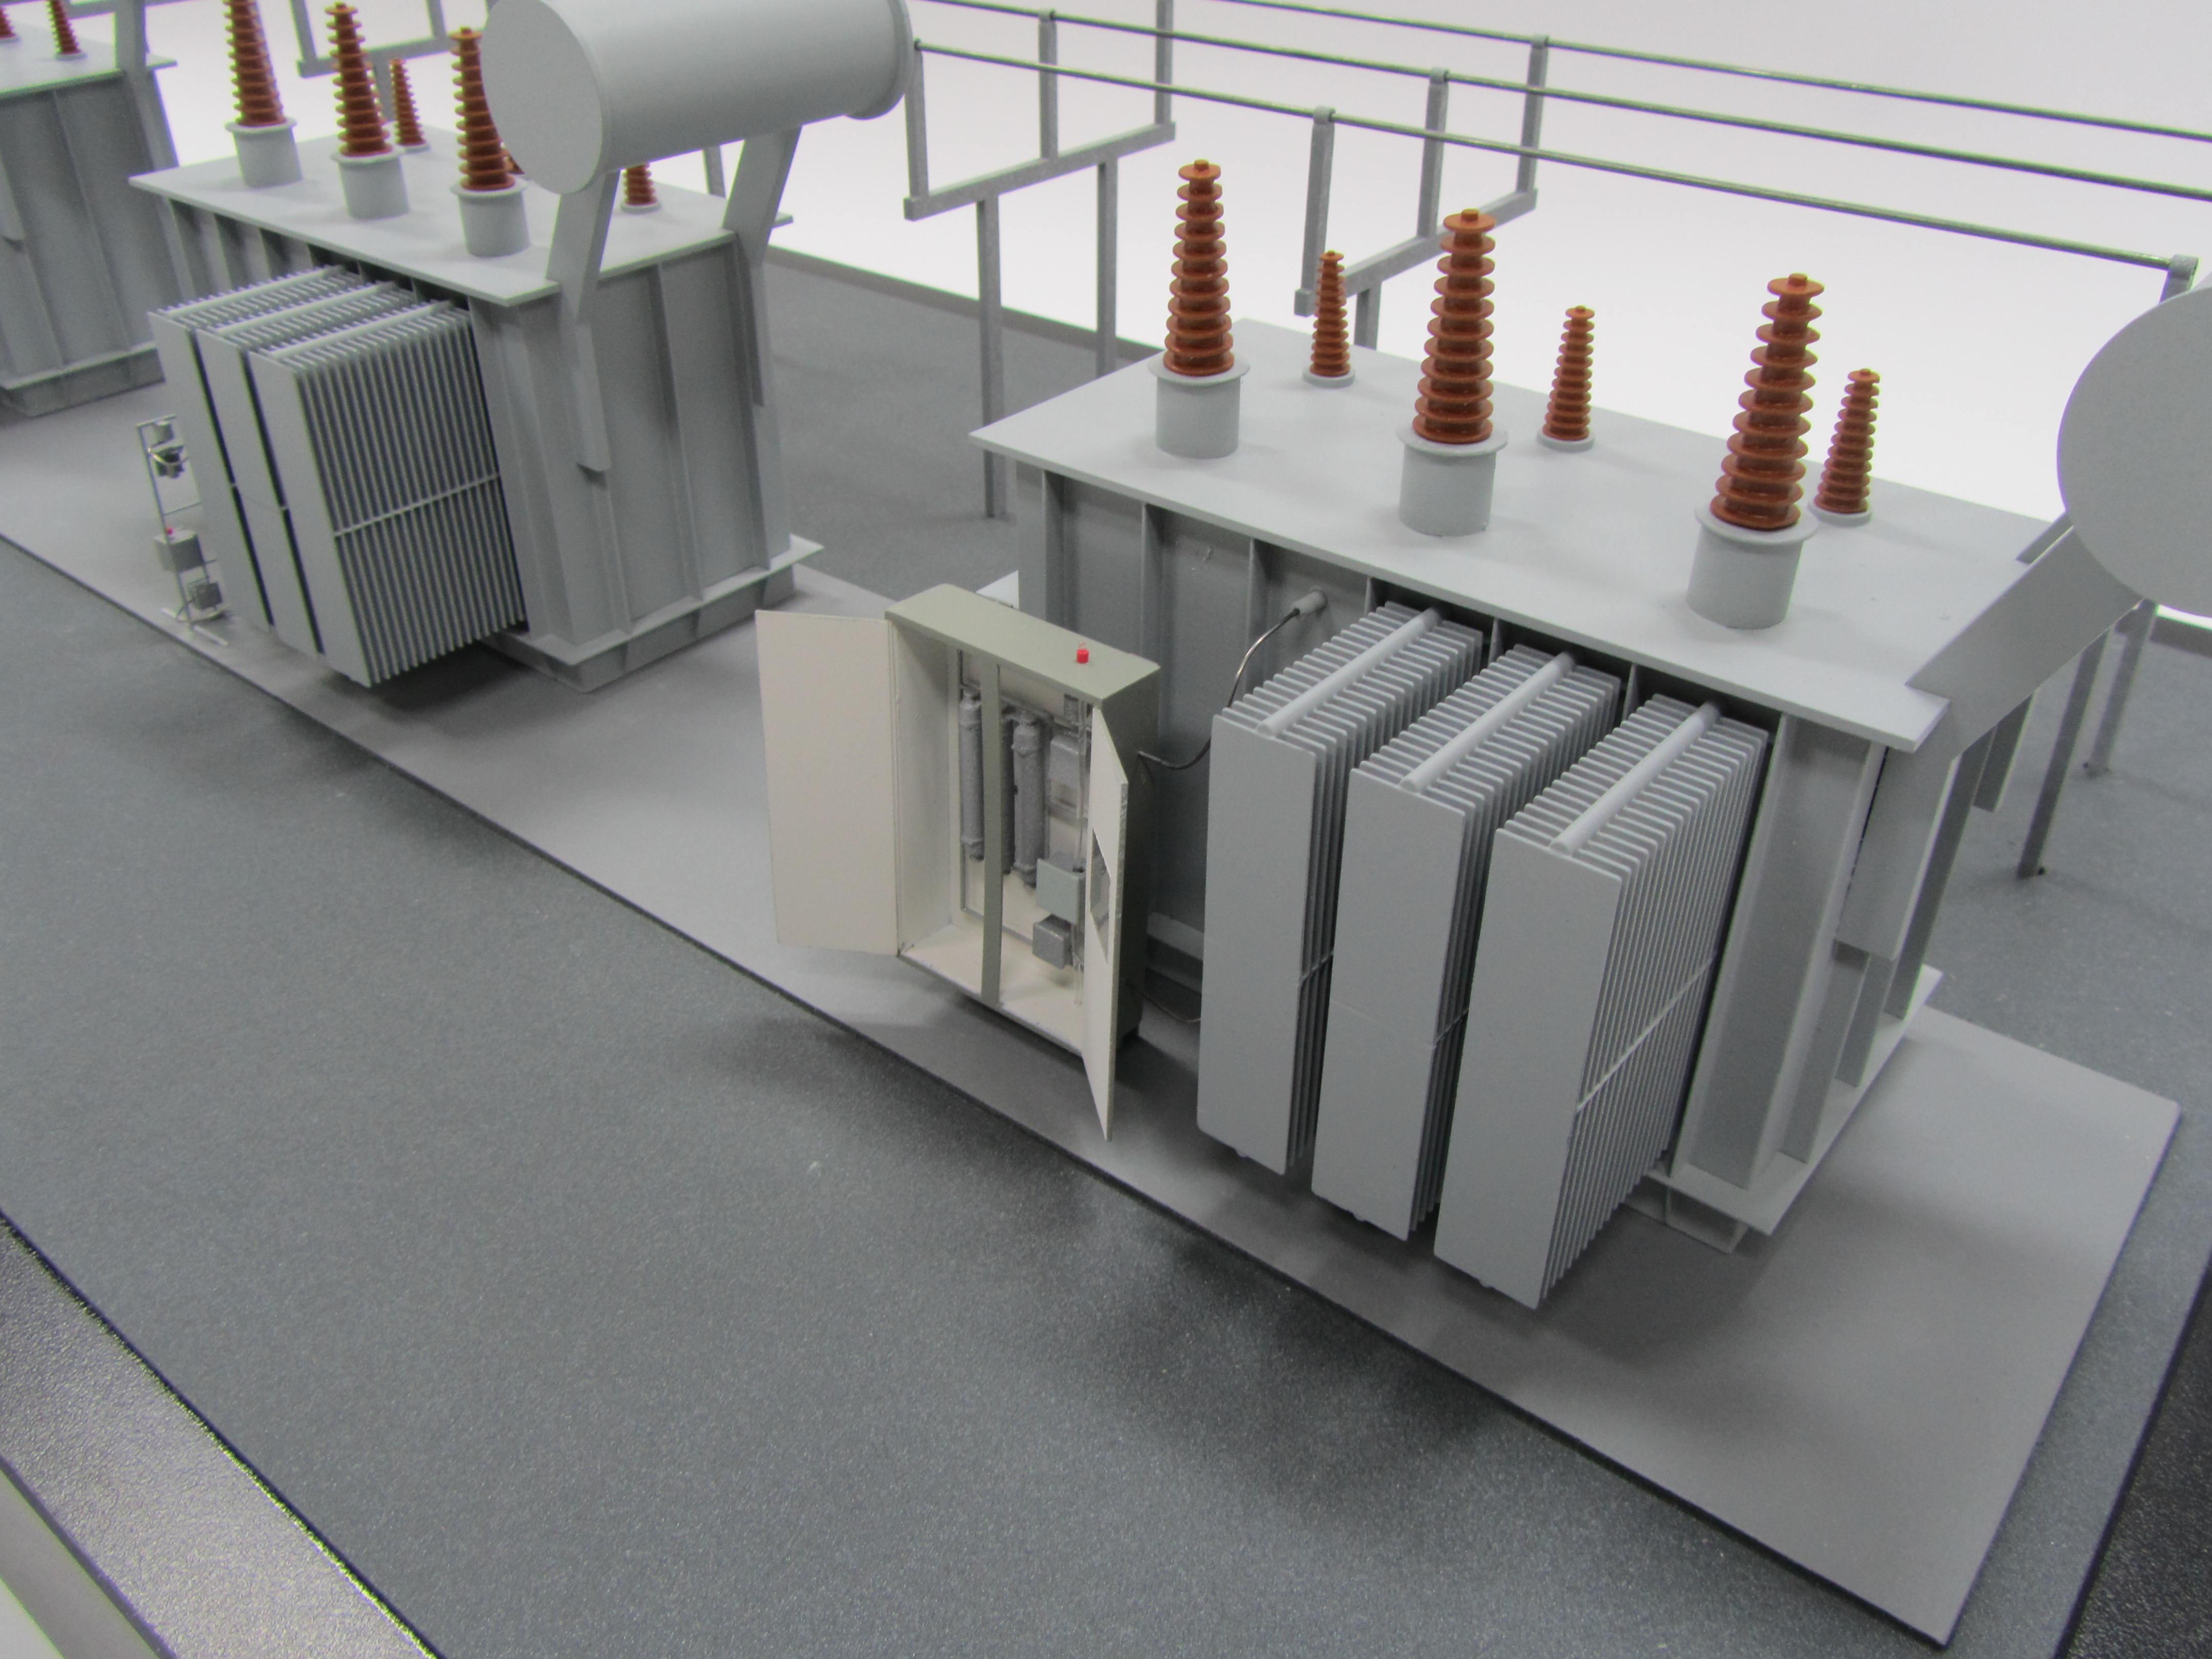 Power Transformer Model - KiwiMill